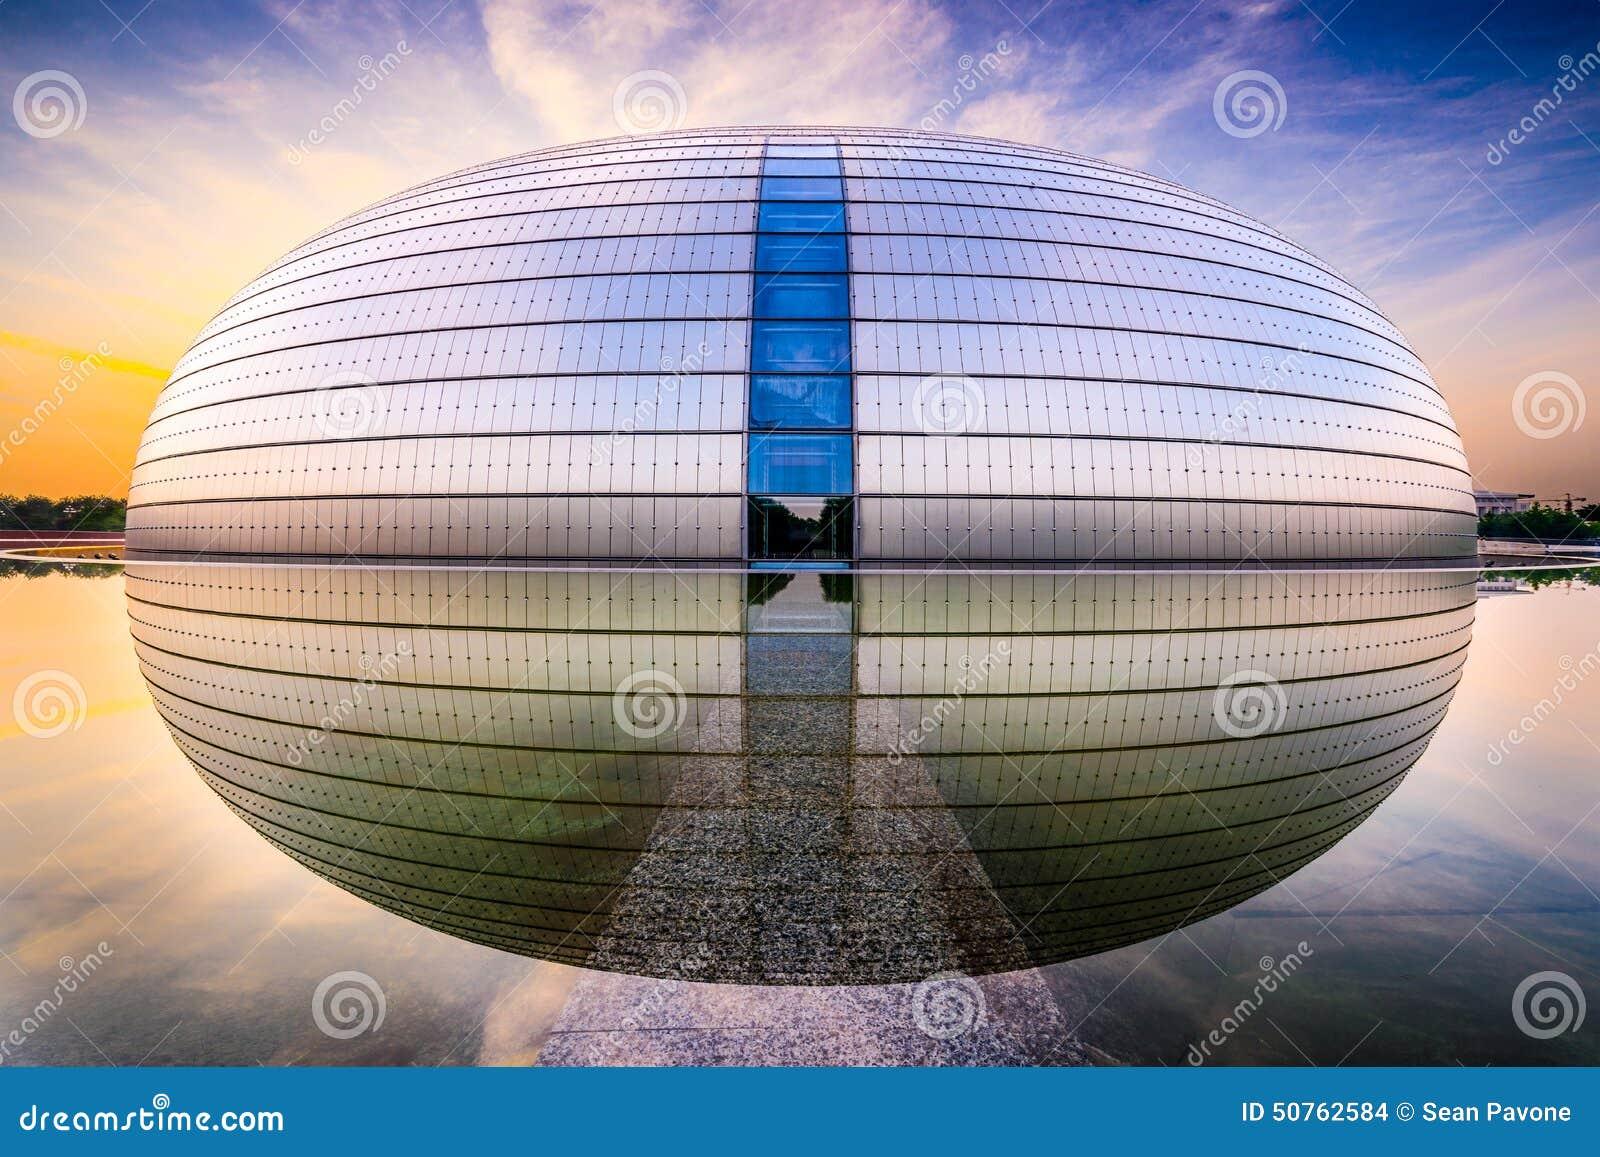 Beijing opera house editorial stock image image of for Beijing opera house architect